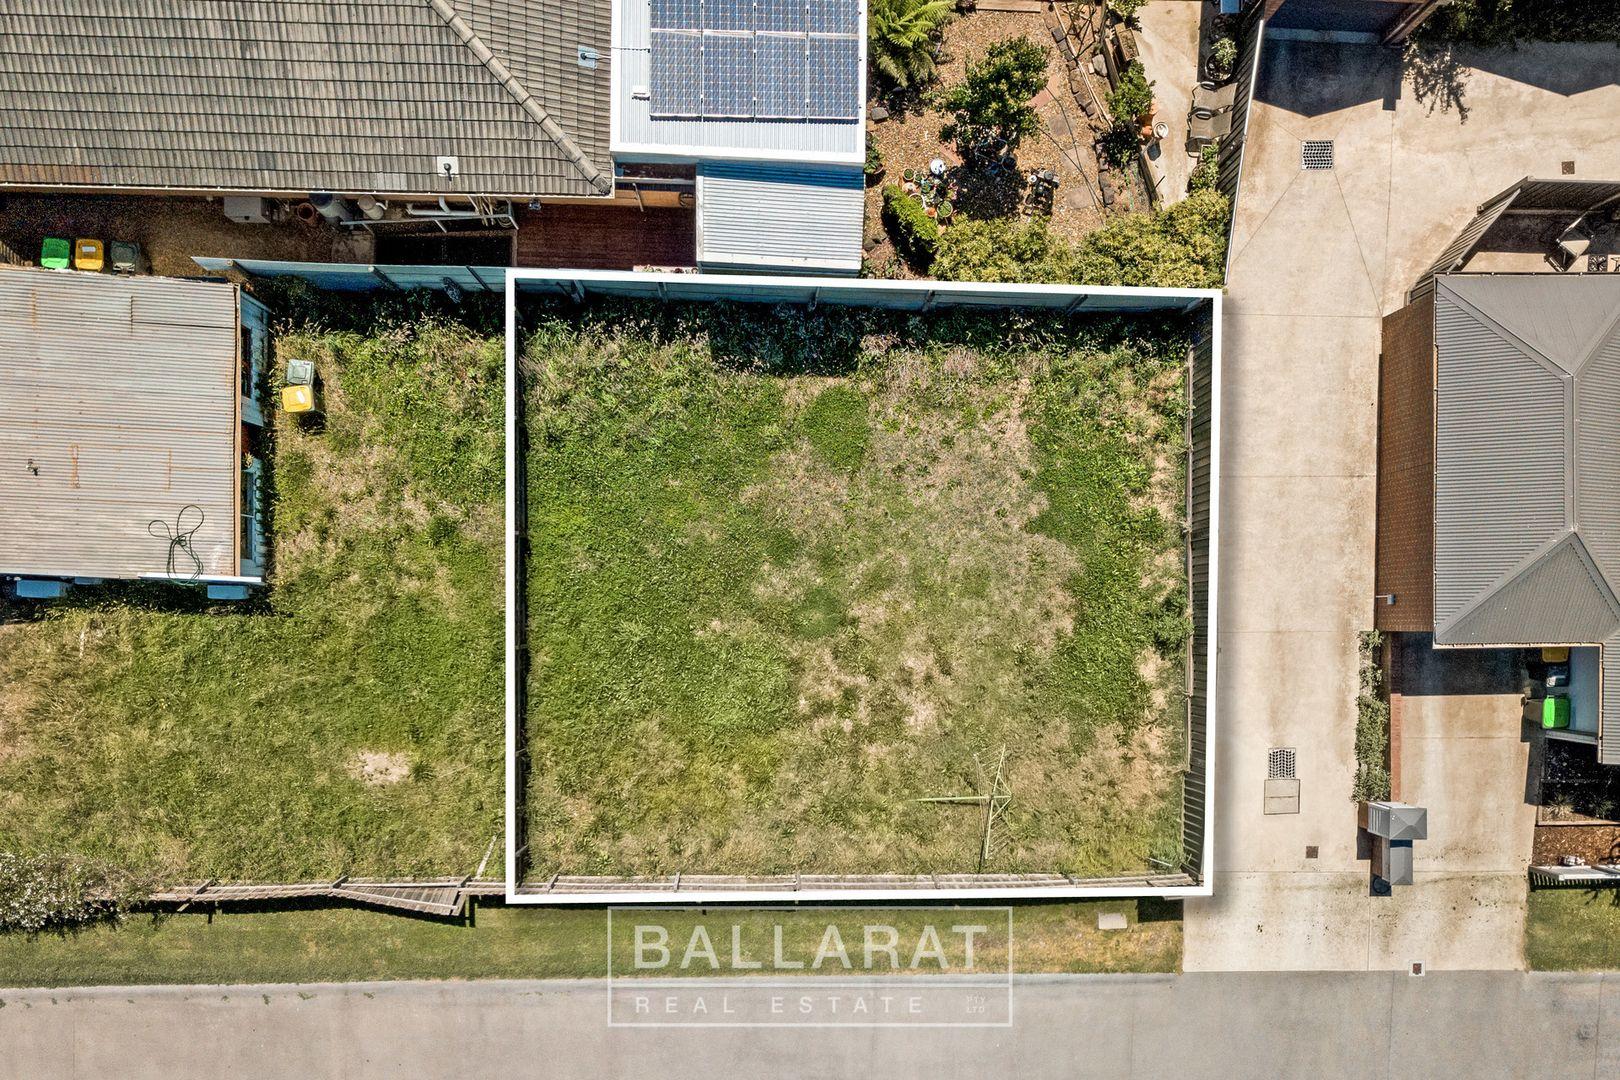 2/17 Queen Street South, Ballarat East VIC 3350, Image 2